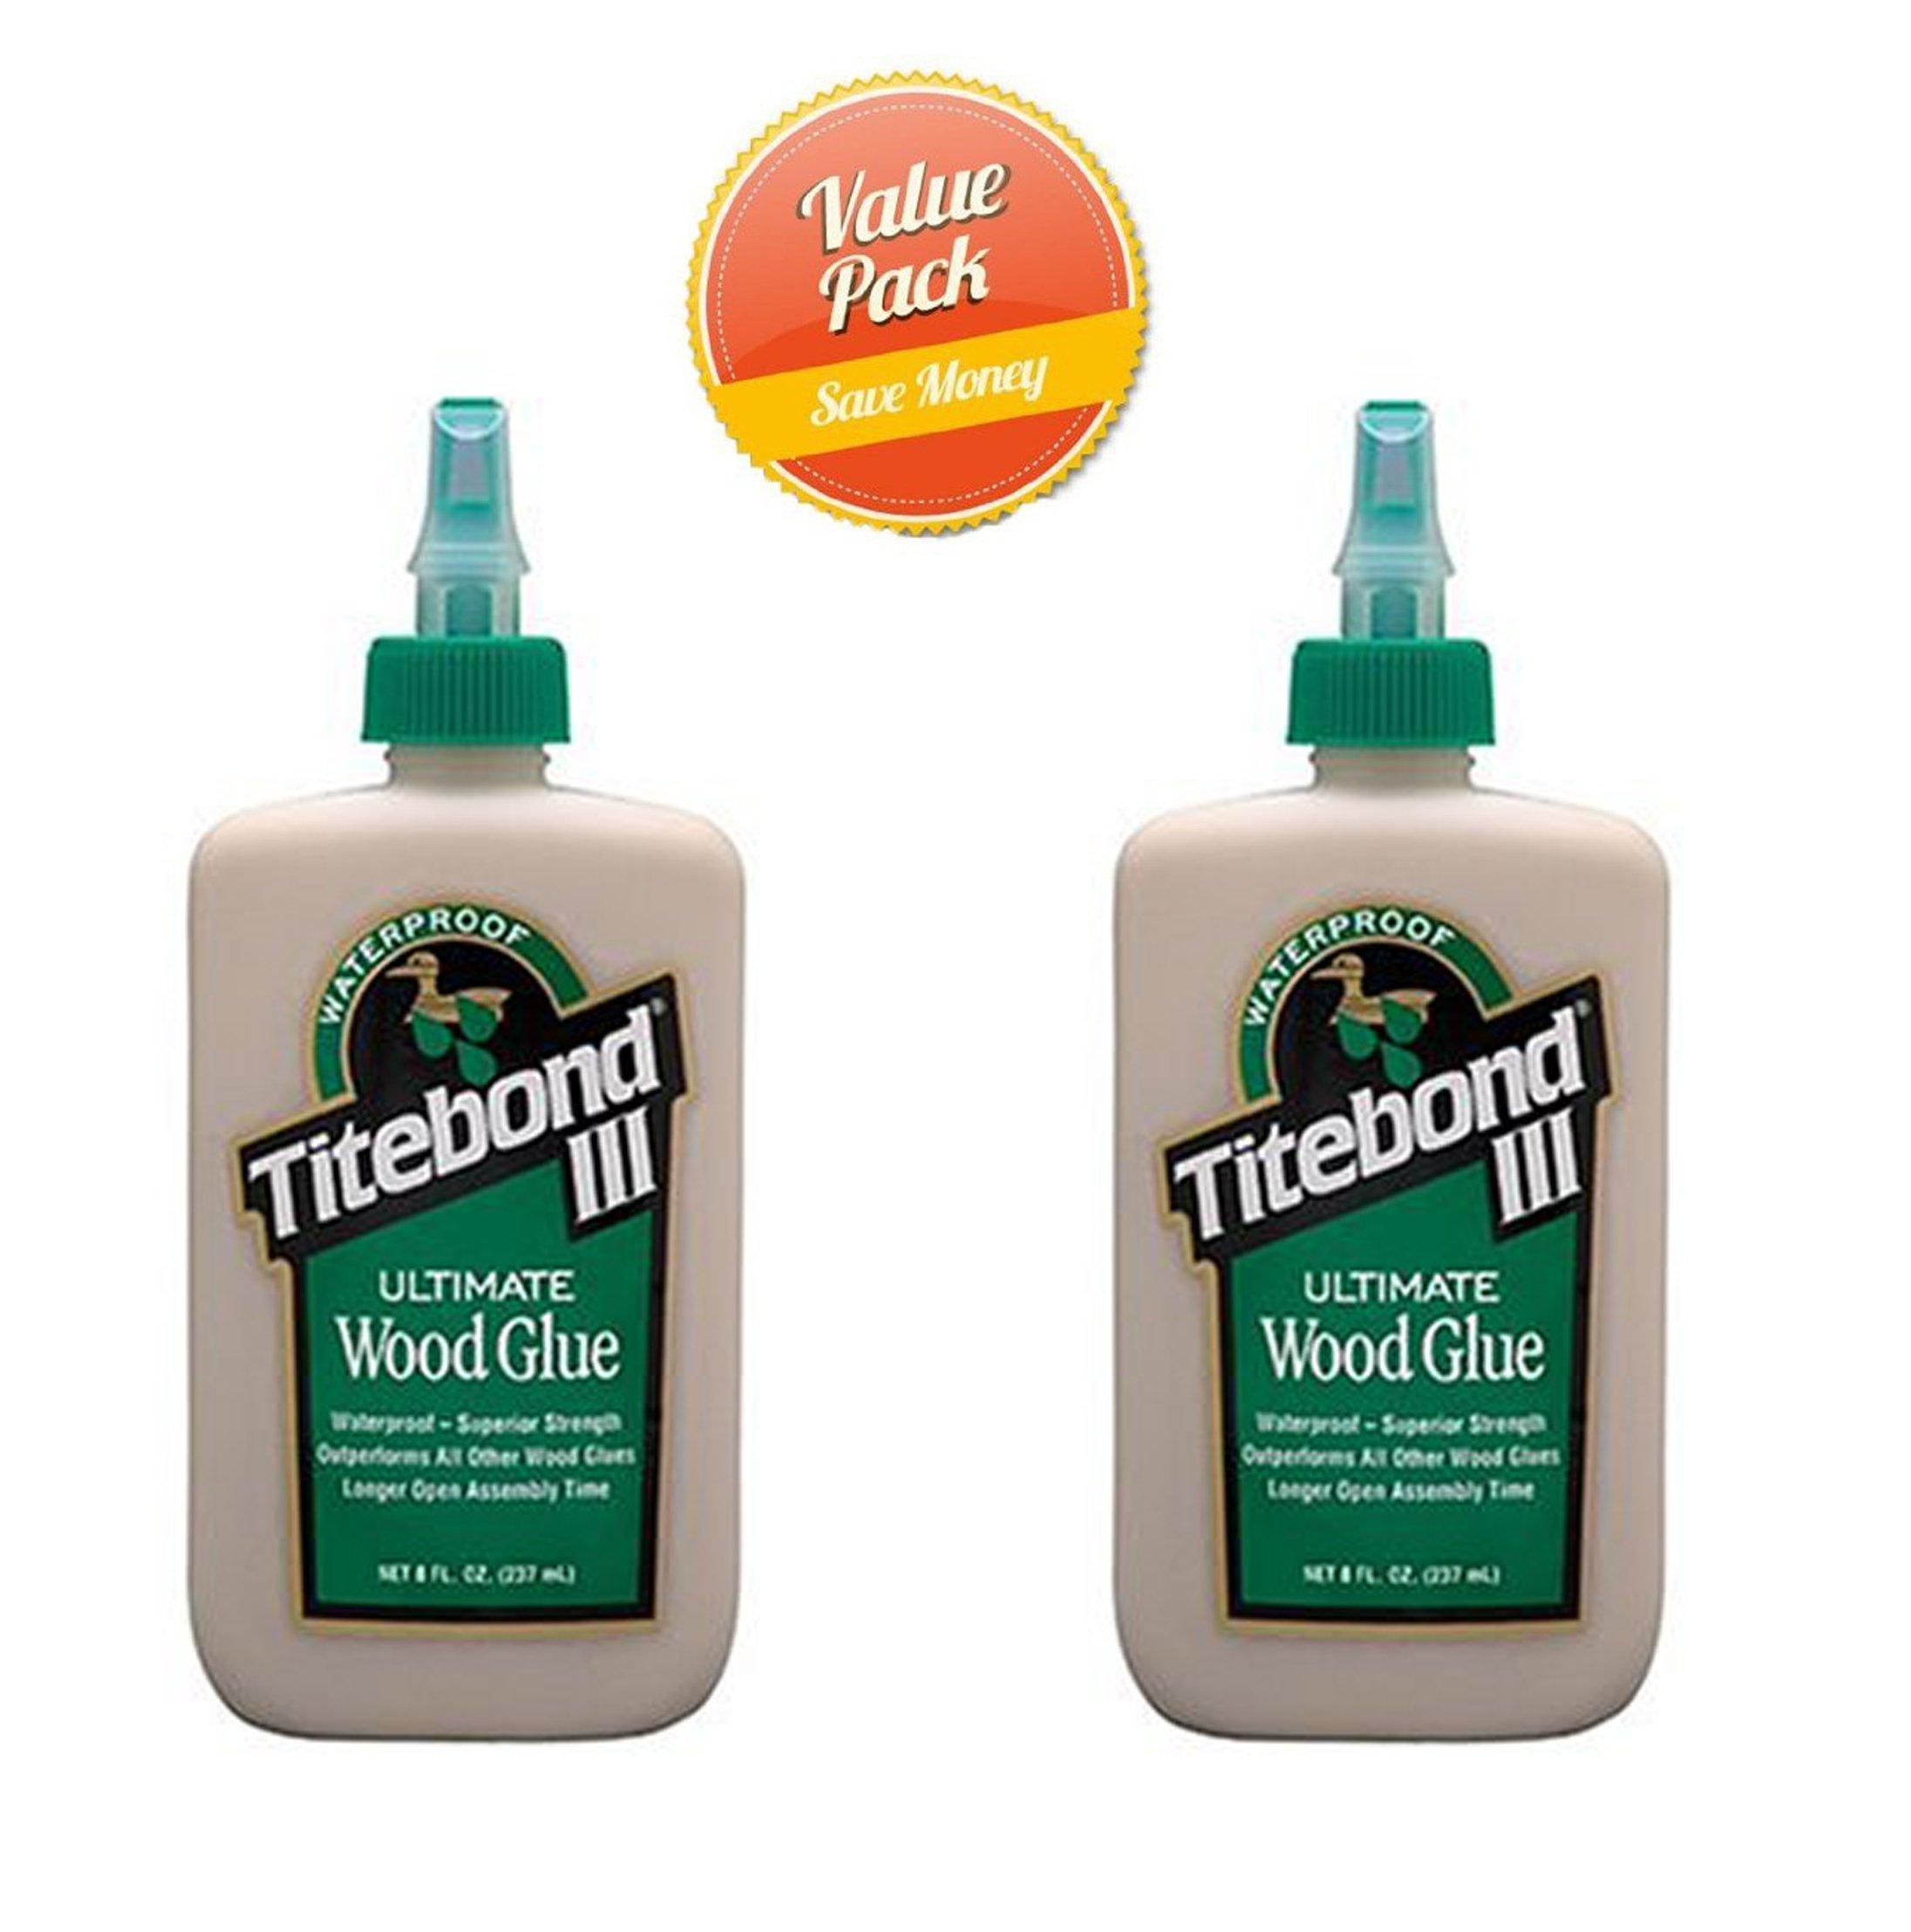 Waterproof Titebond III Wood Glue